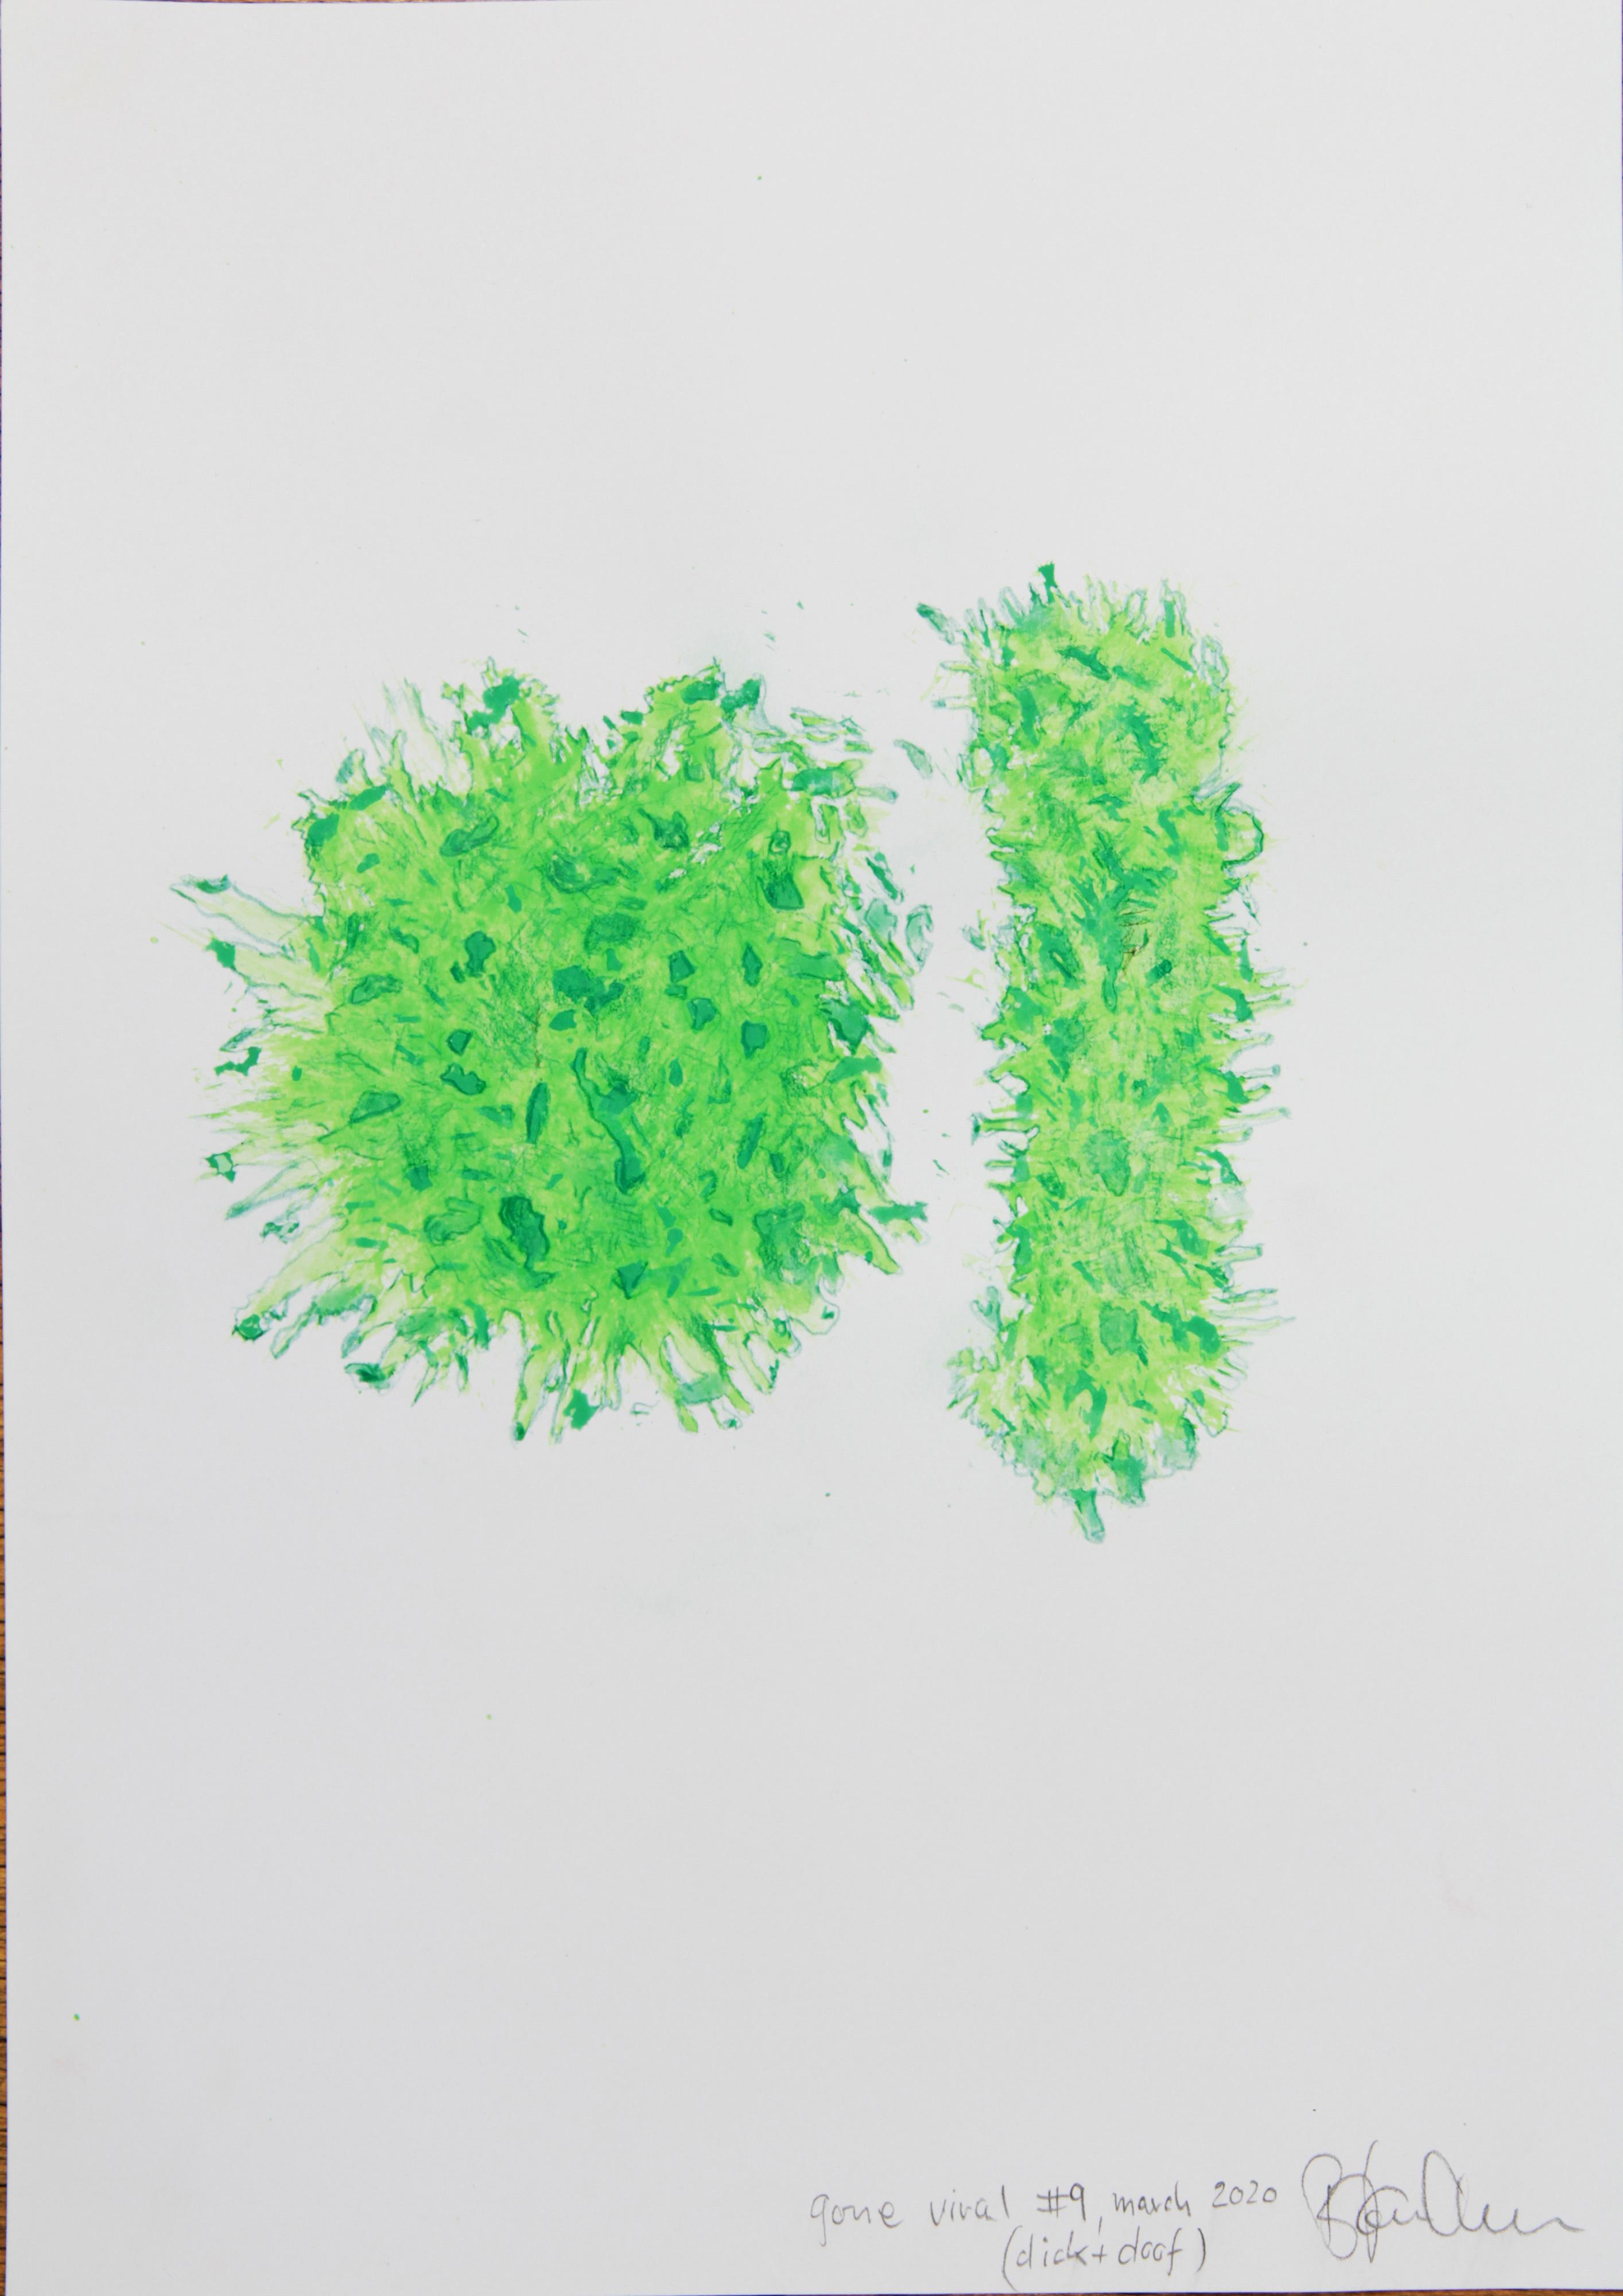 Galerie Barbara Thumm \ New Viewings #12 \ Bjørn Melhus